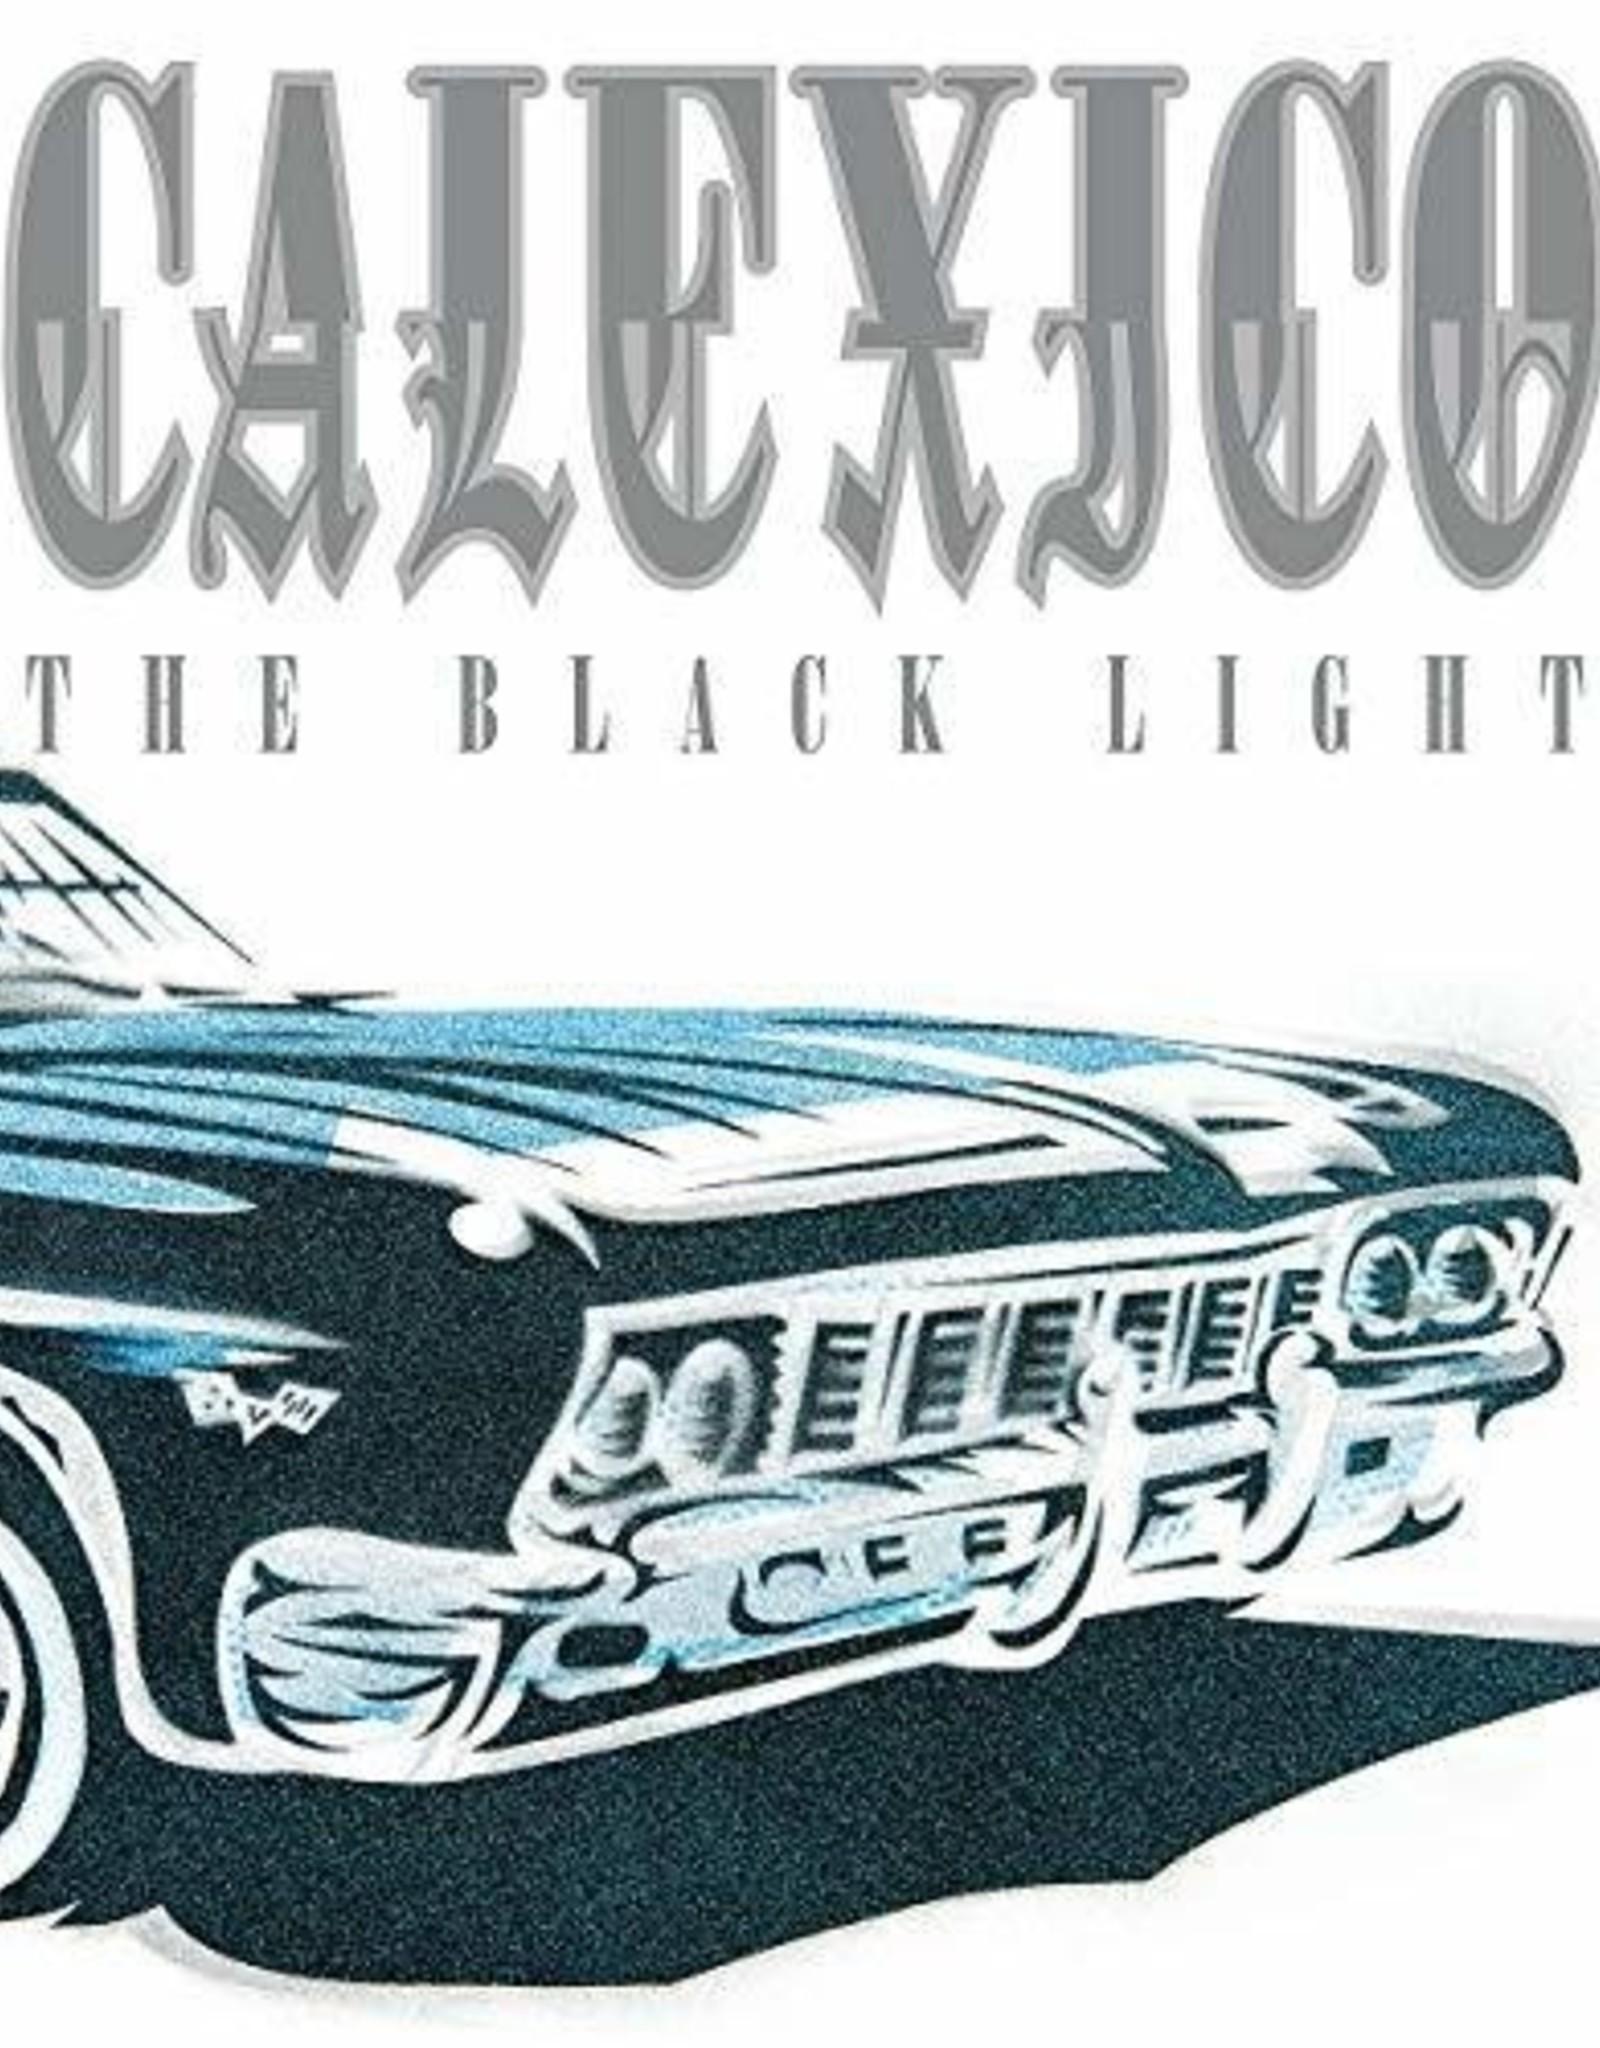 Calexico - The Black Light (20Th Anniversary Edition) [Crystal Clear Vinyl]